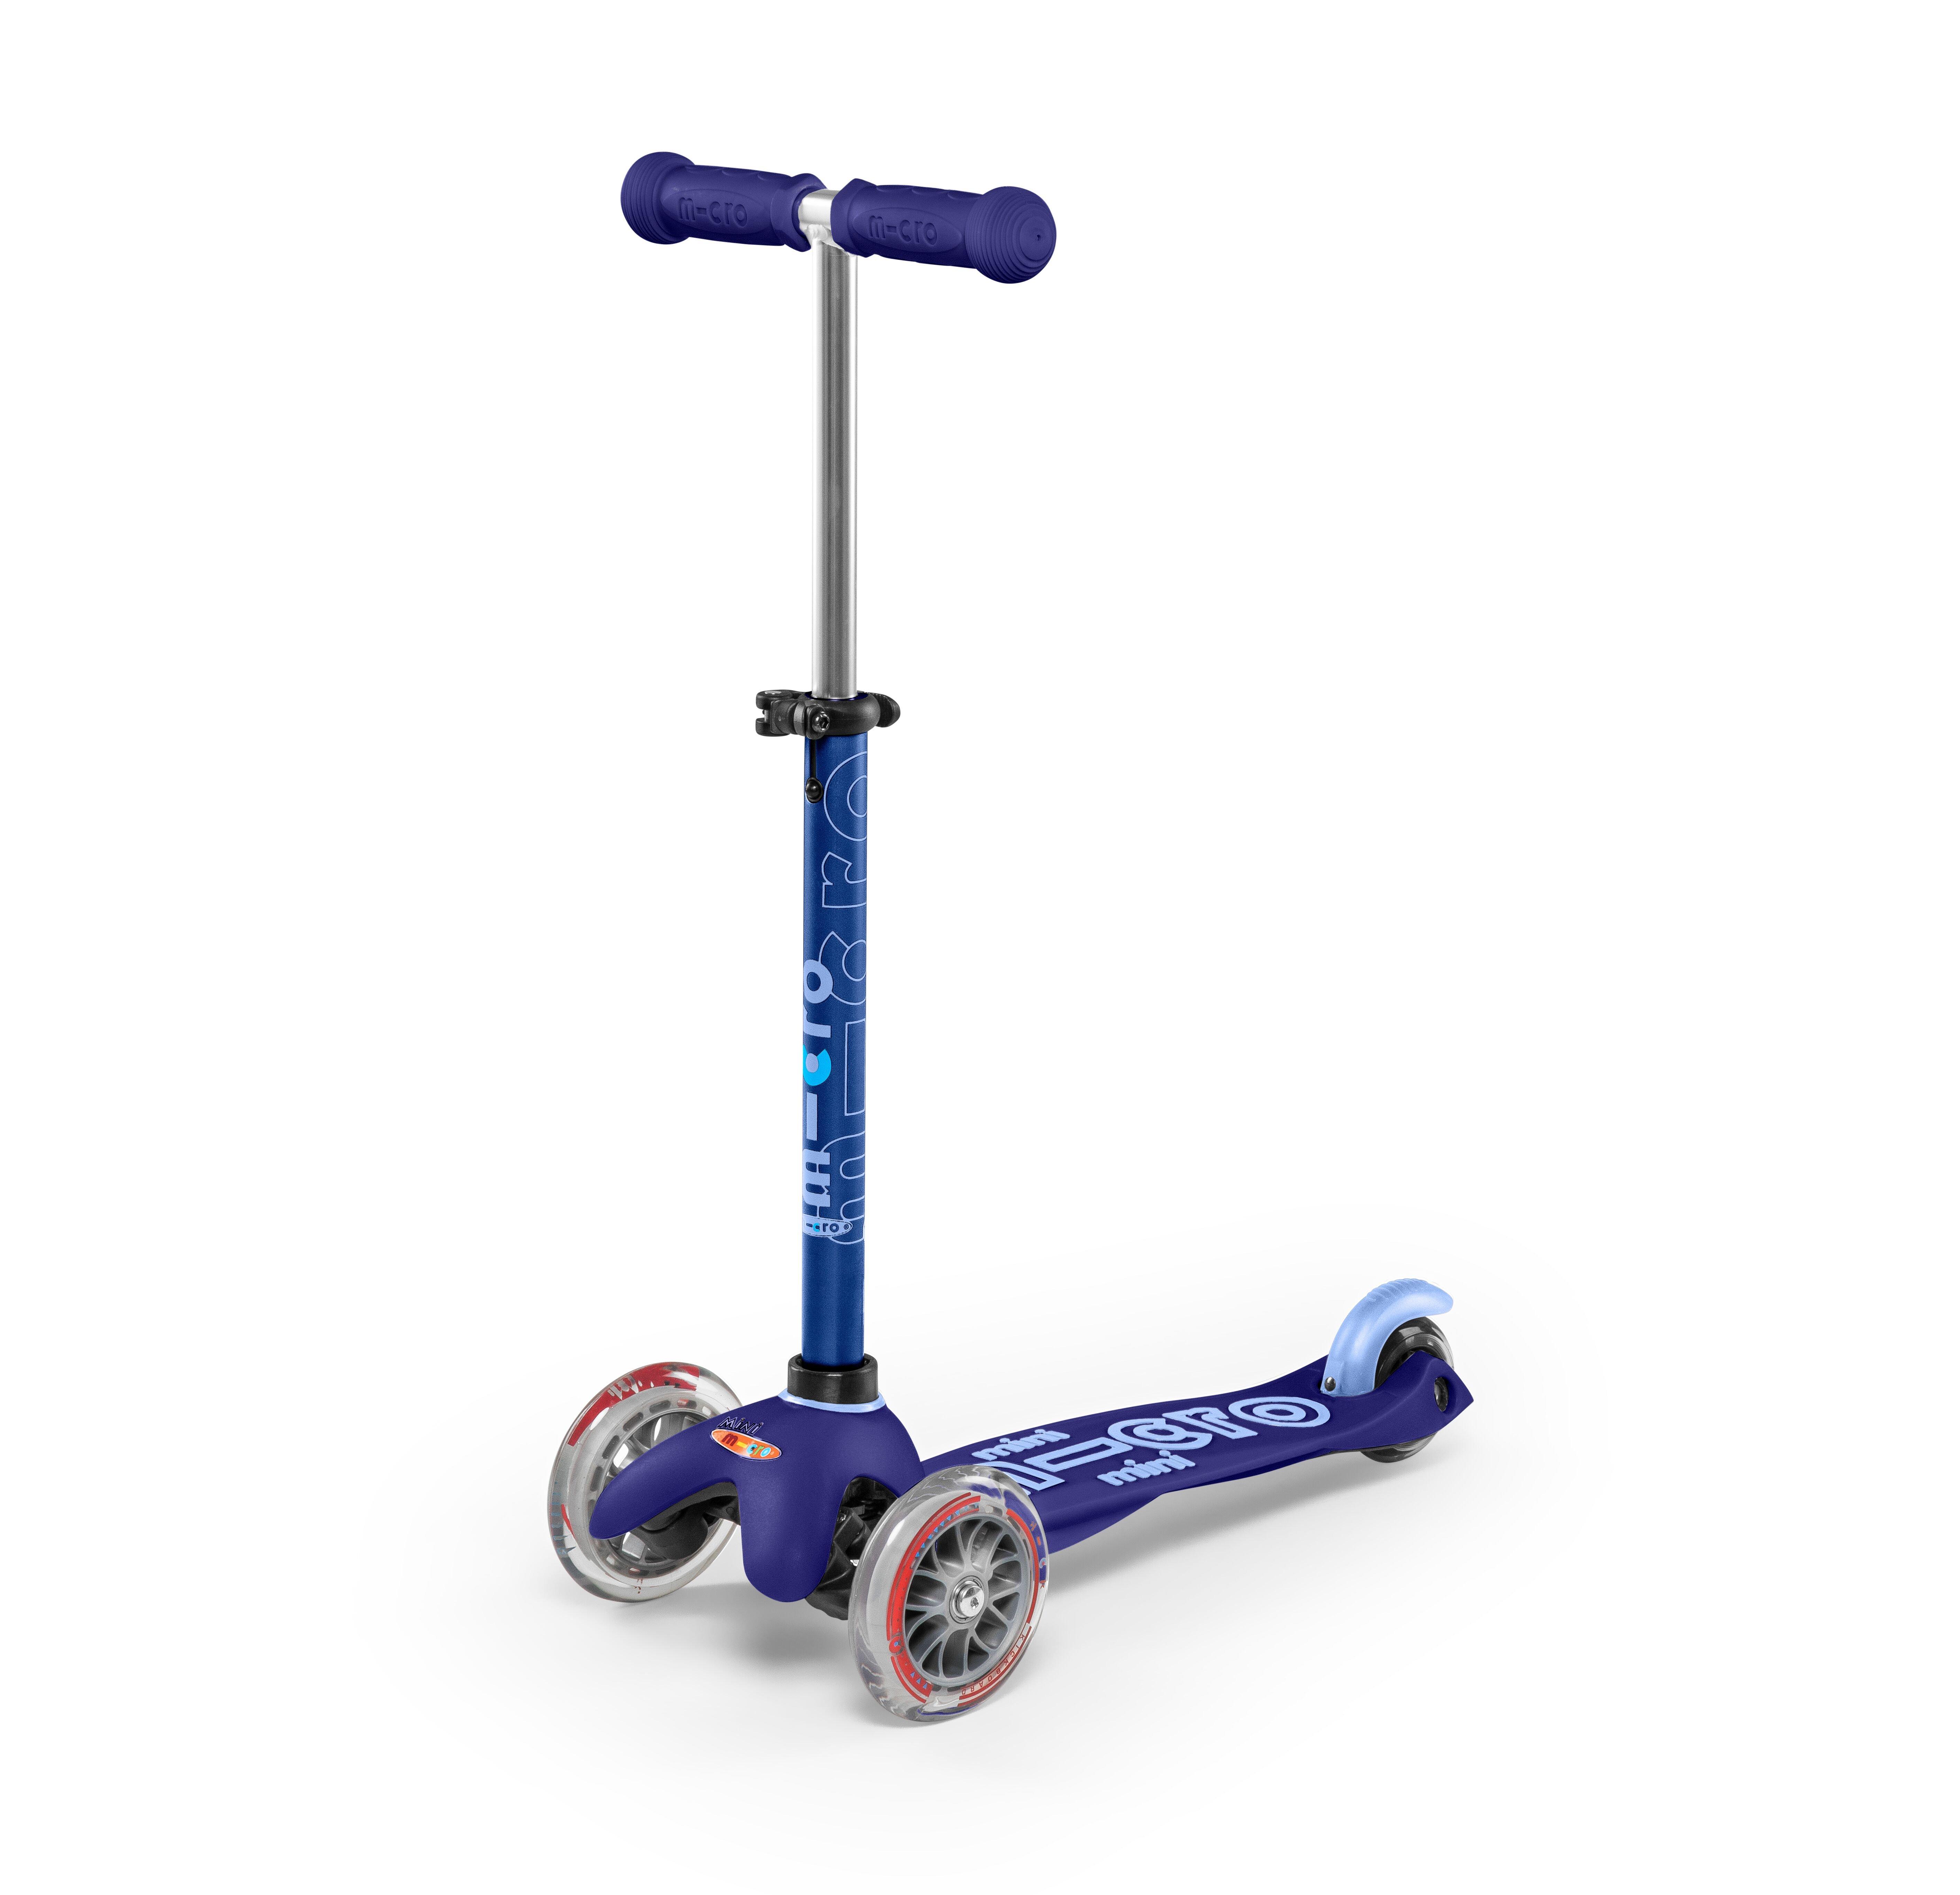 Micro - Mini Deluxe Scooter - Blue (MMD006)